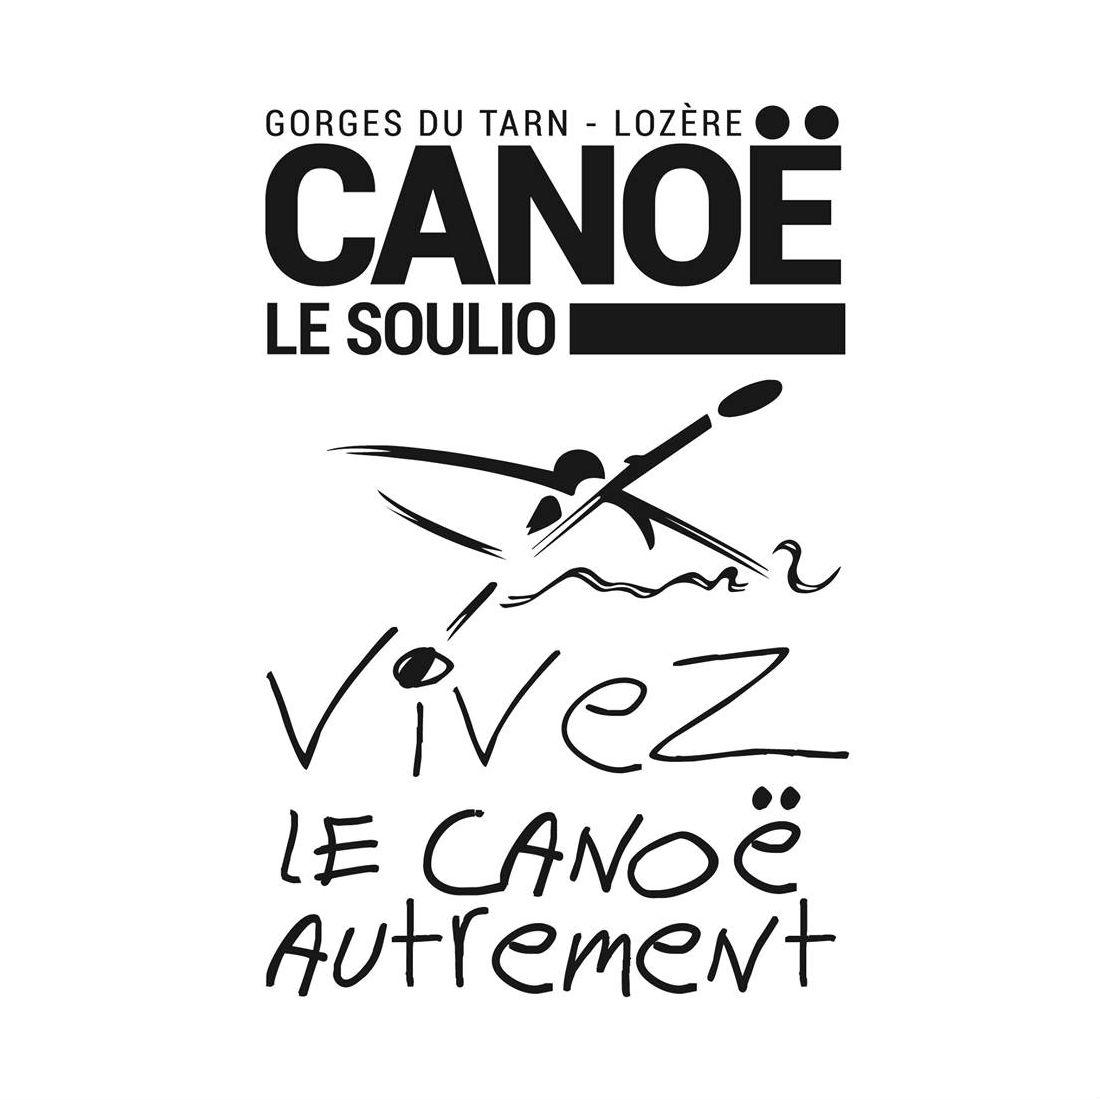 Eenvoudige Kanoën in La Malène - Cirque des Baumes